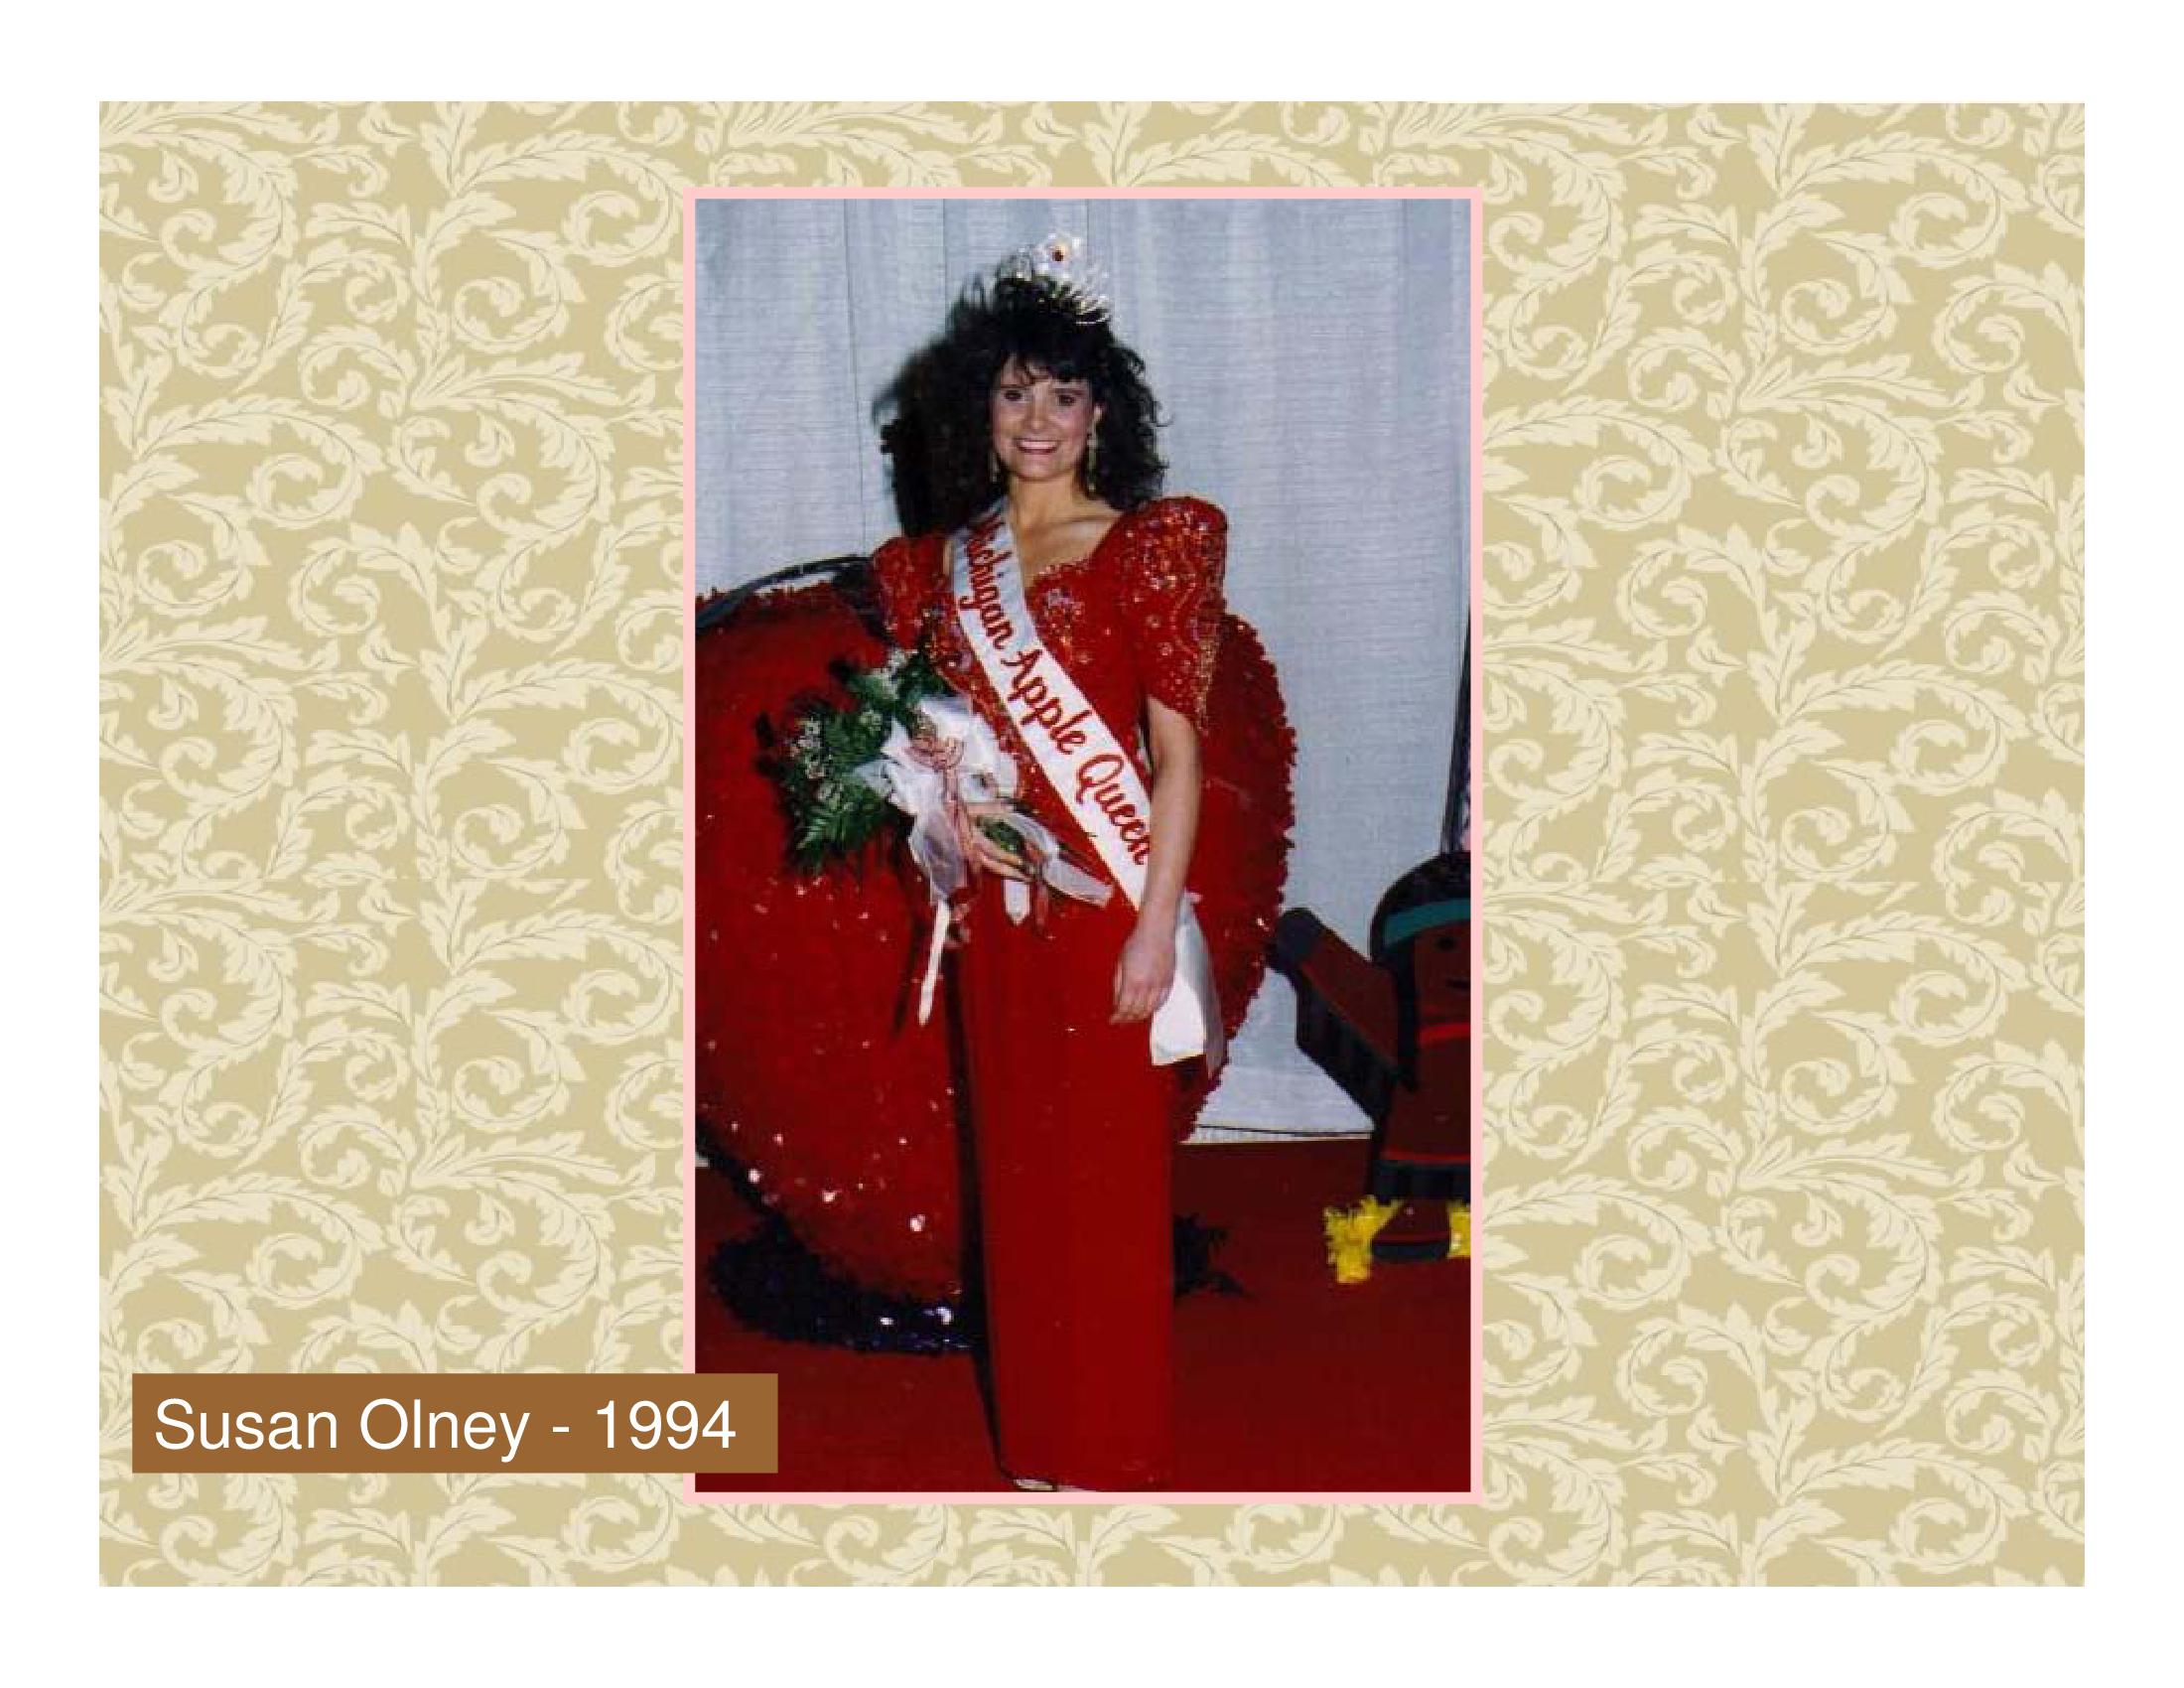 Susan Olney - 1994